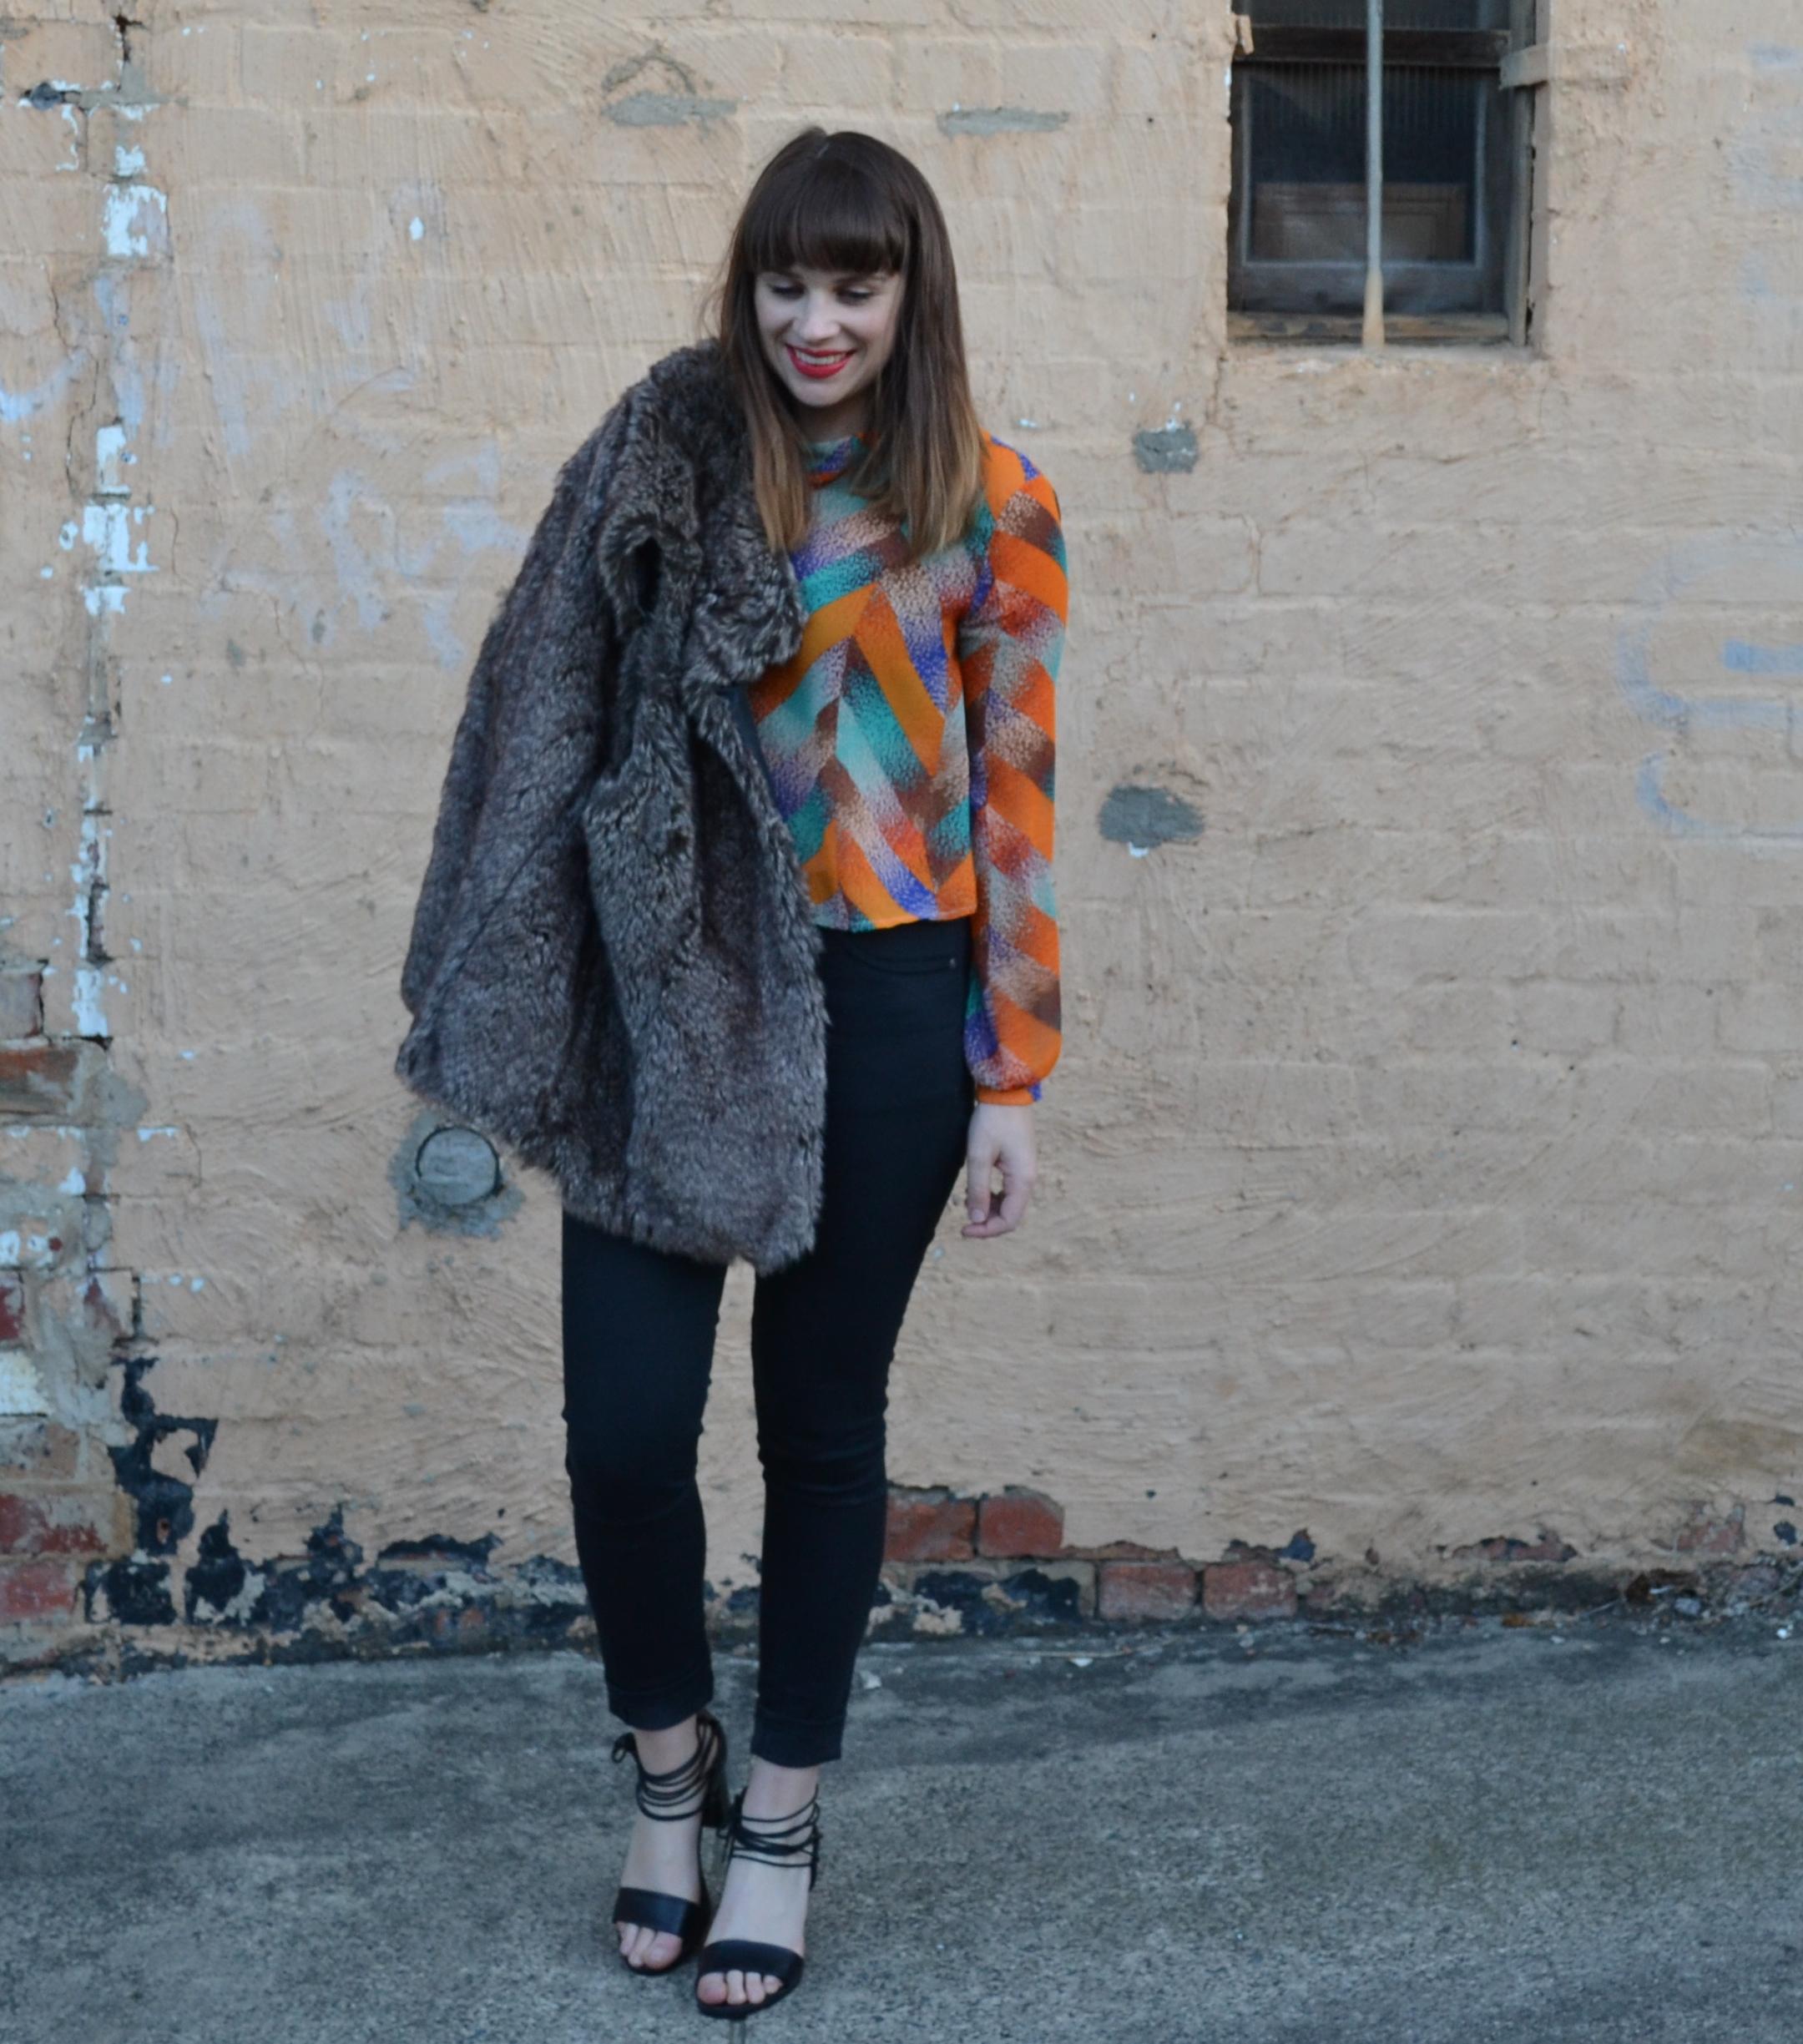 fur-vest-black-jeans-girl-bangs